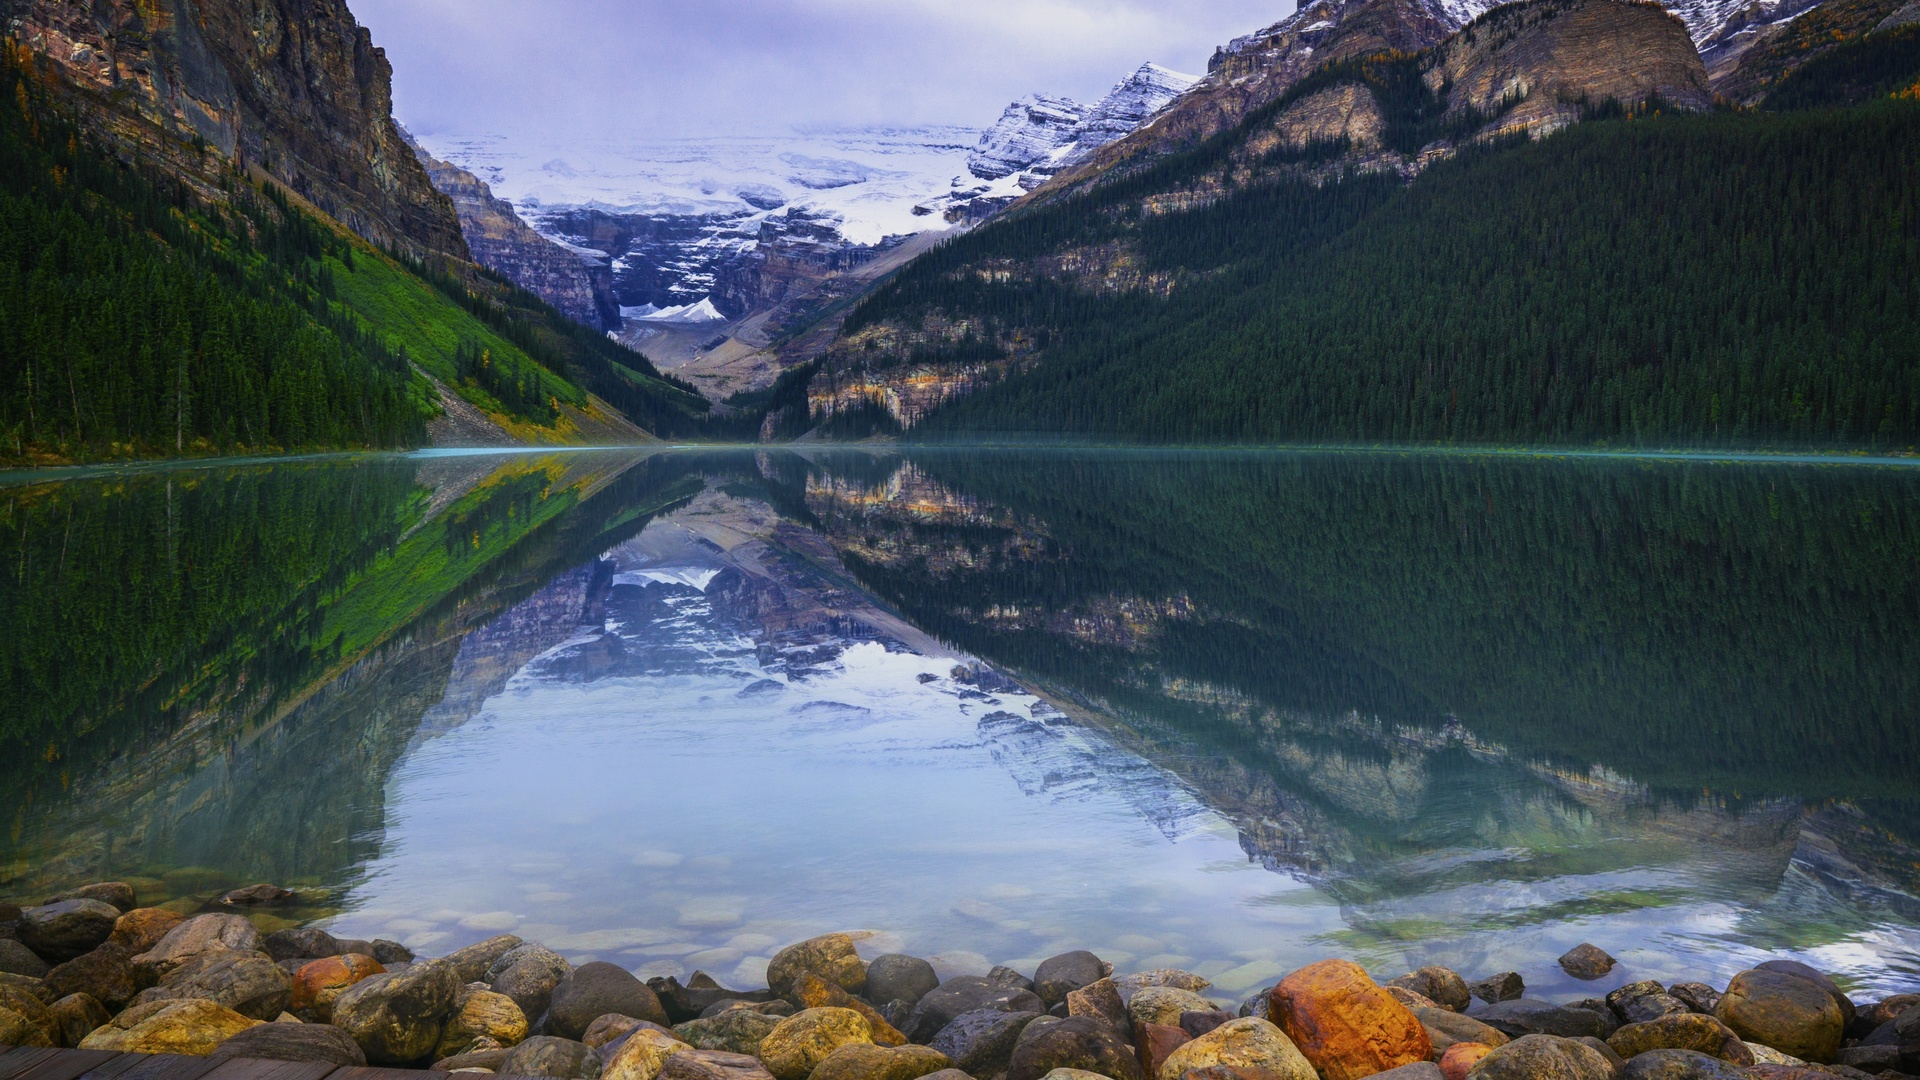 горы, озеро, камни, лето